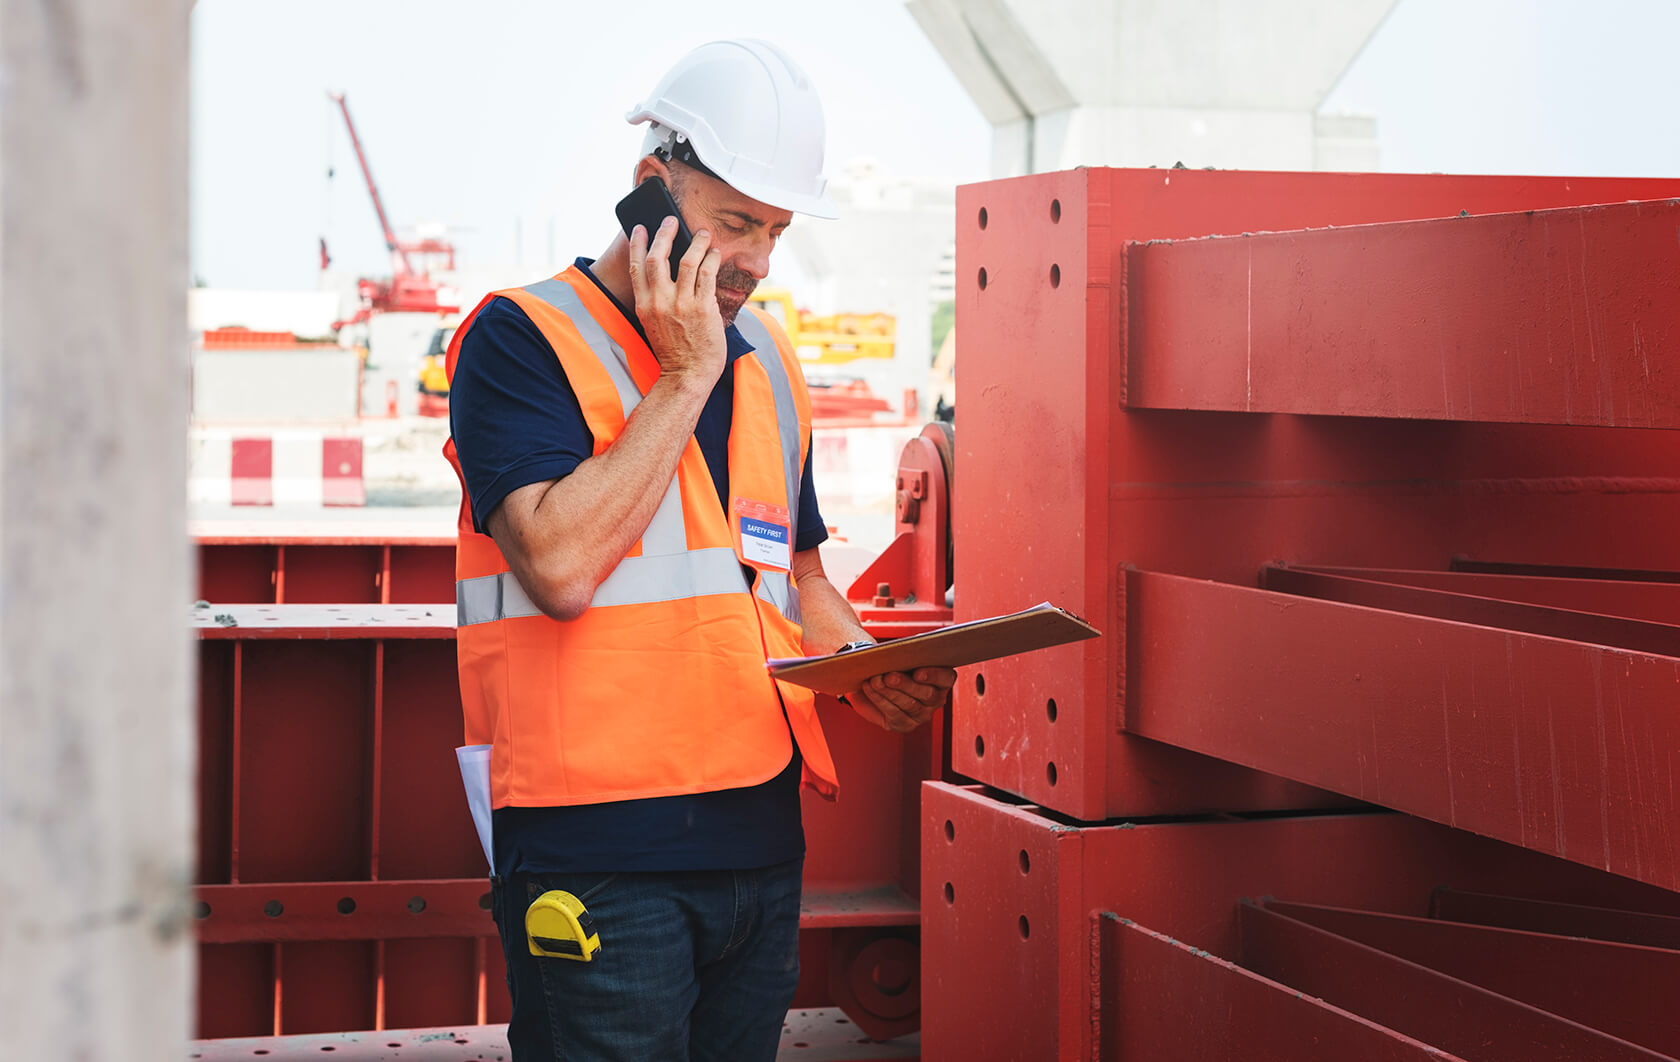 single working man outdoors construction concept P4A3MRU - تجزیه اطلاعات و بررسی مواد